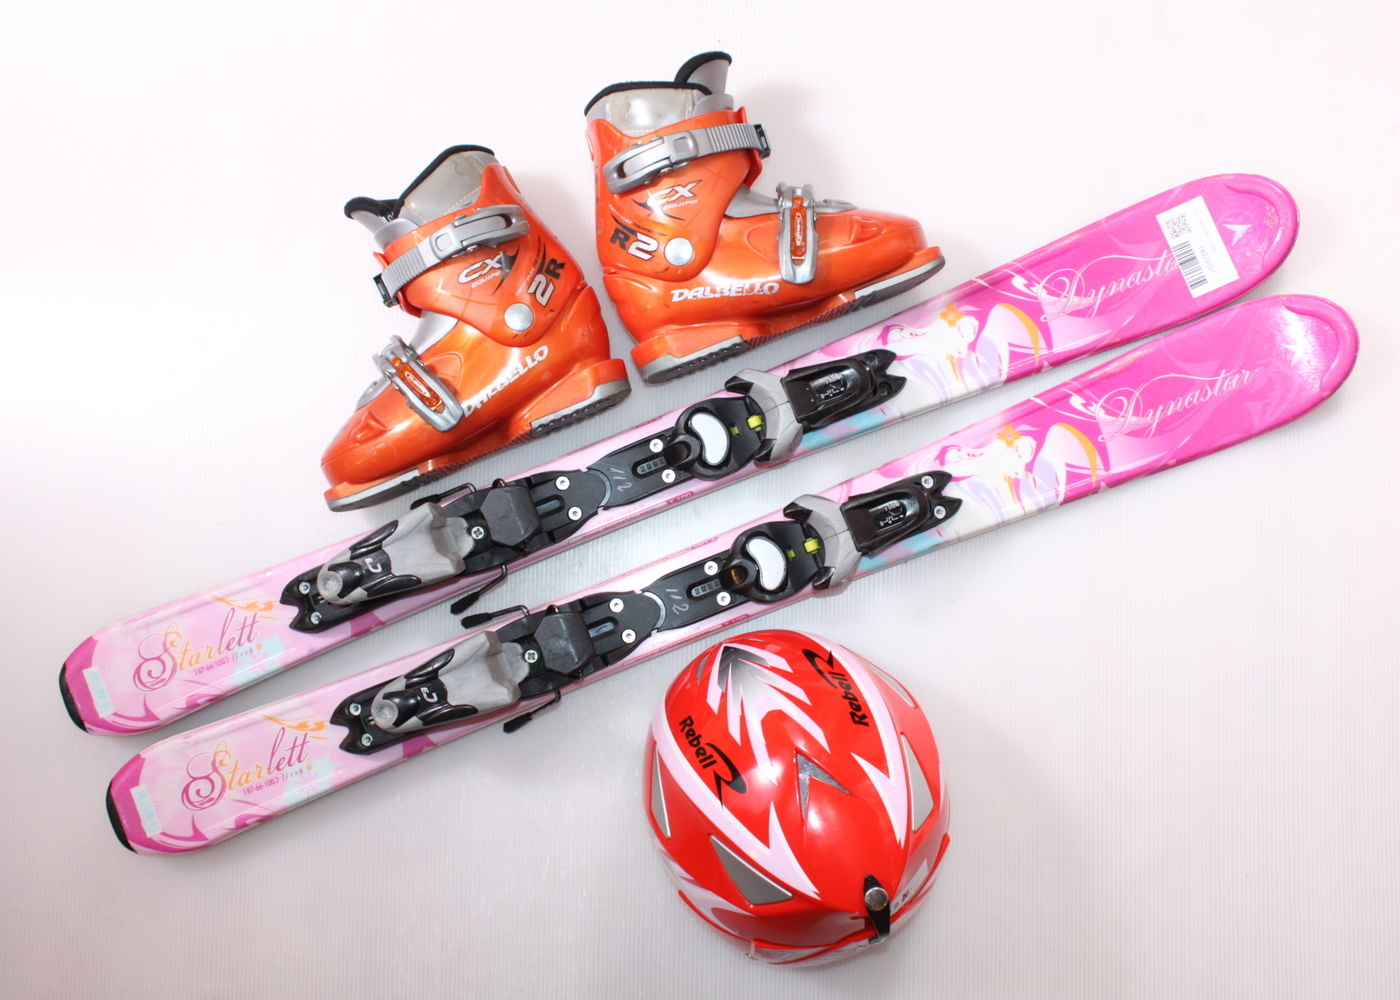 Dětské lyže DYNASTAR STARLETT 100 cm + lyžáky  31EU + helma